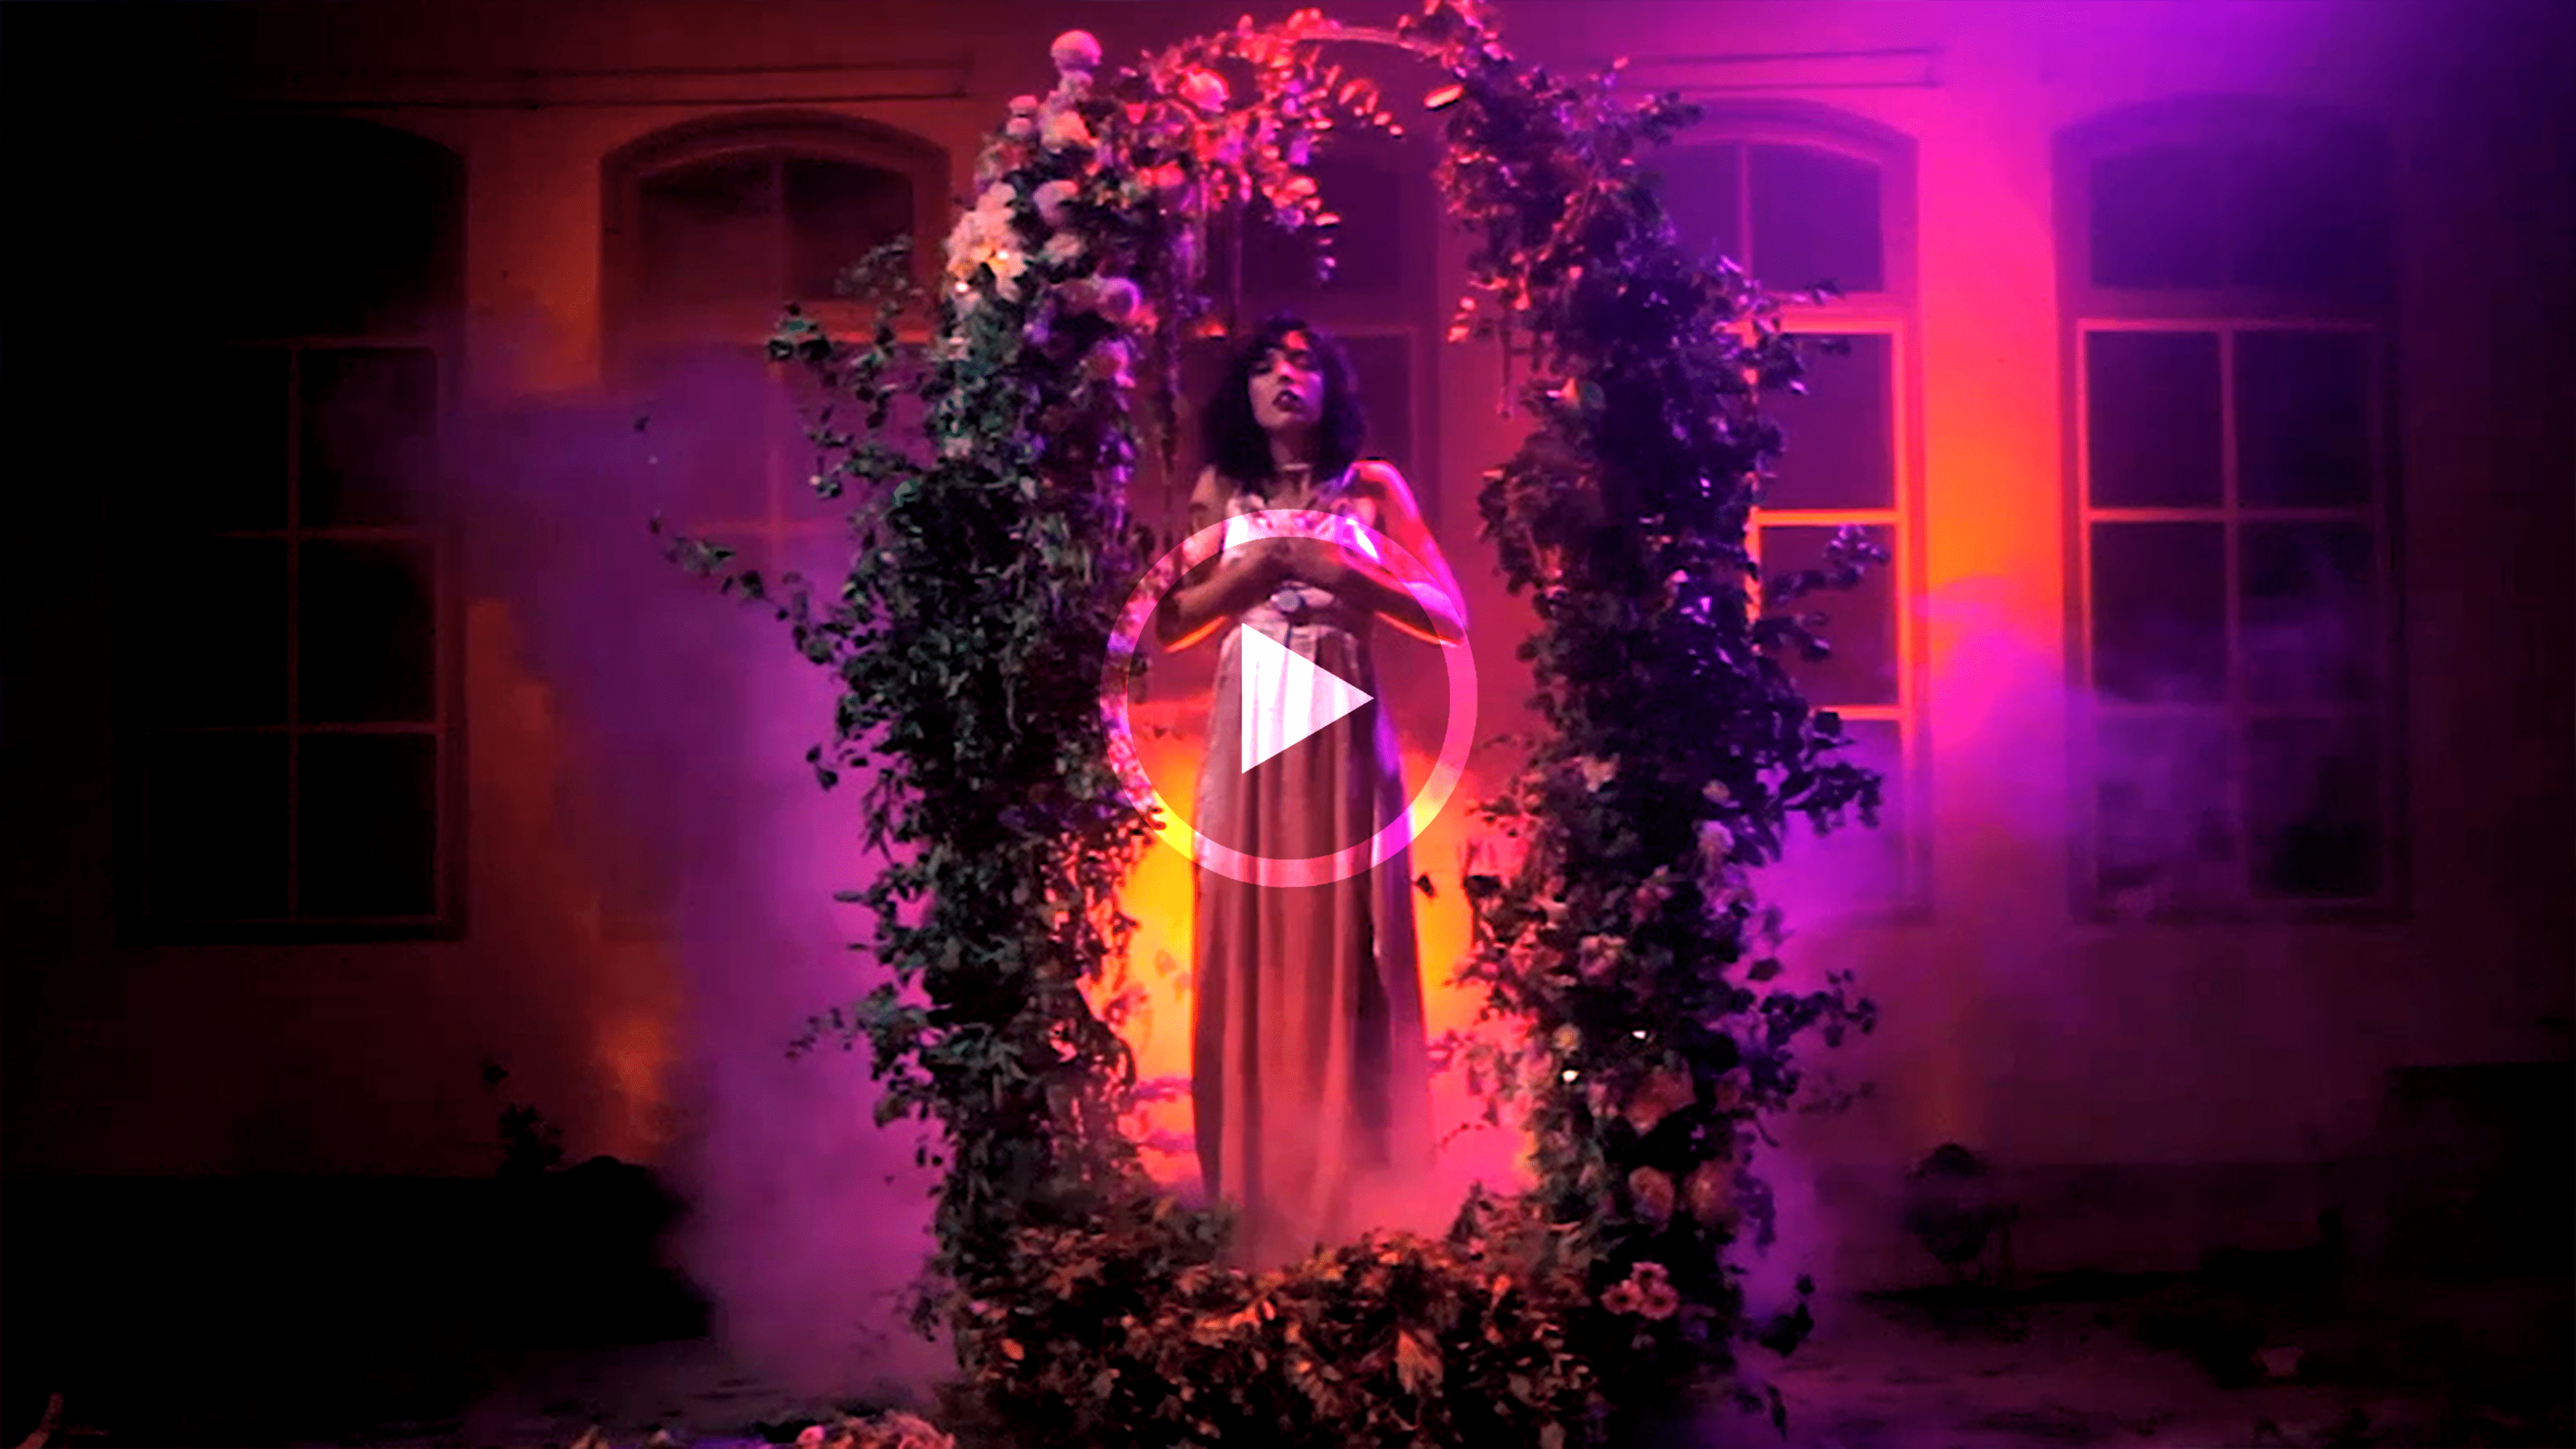 LA CULTURA DEL EXCESO | Videoclip (Dir. Miki Tejero)